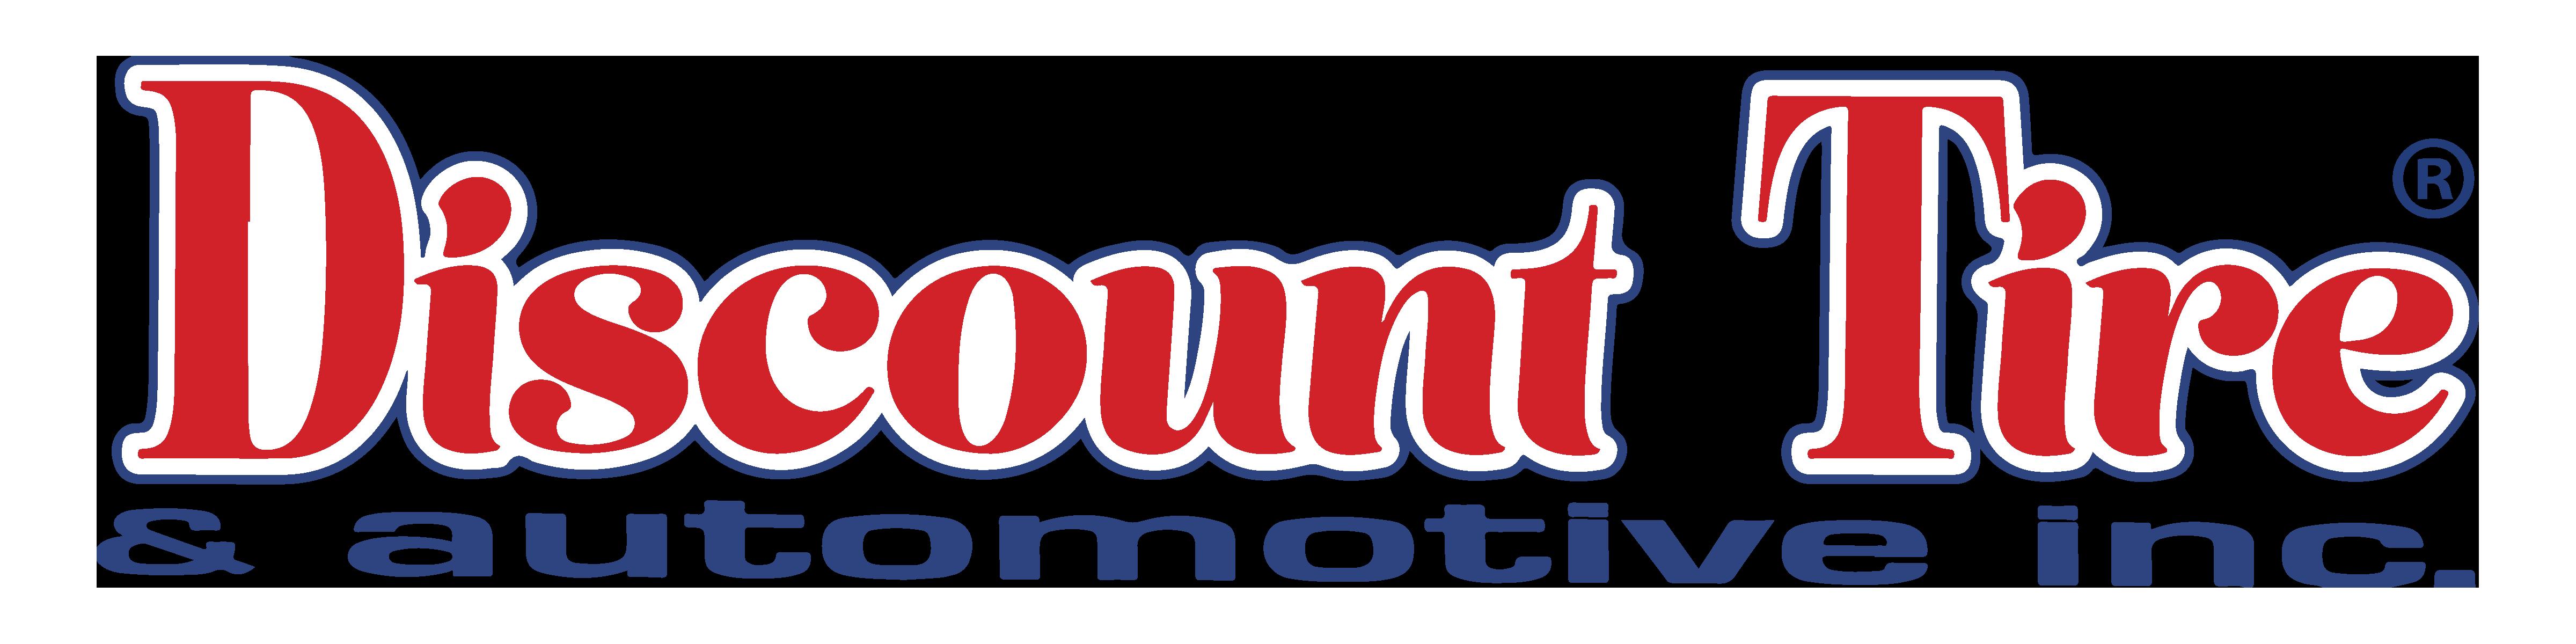 Discount Tire.